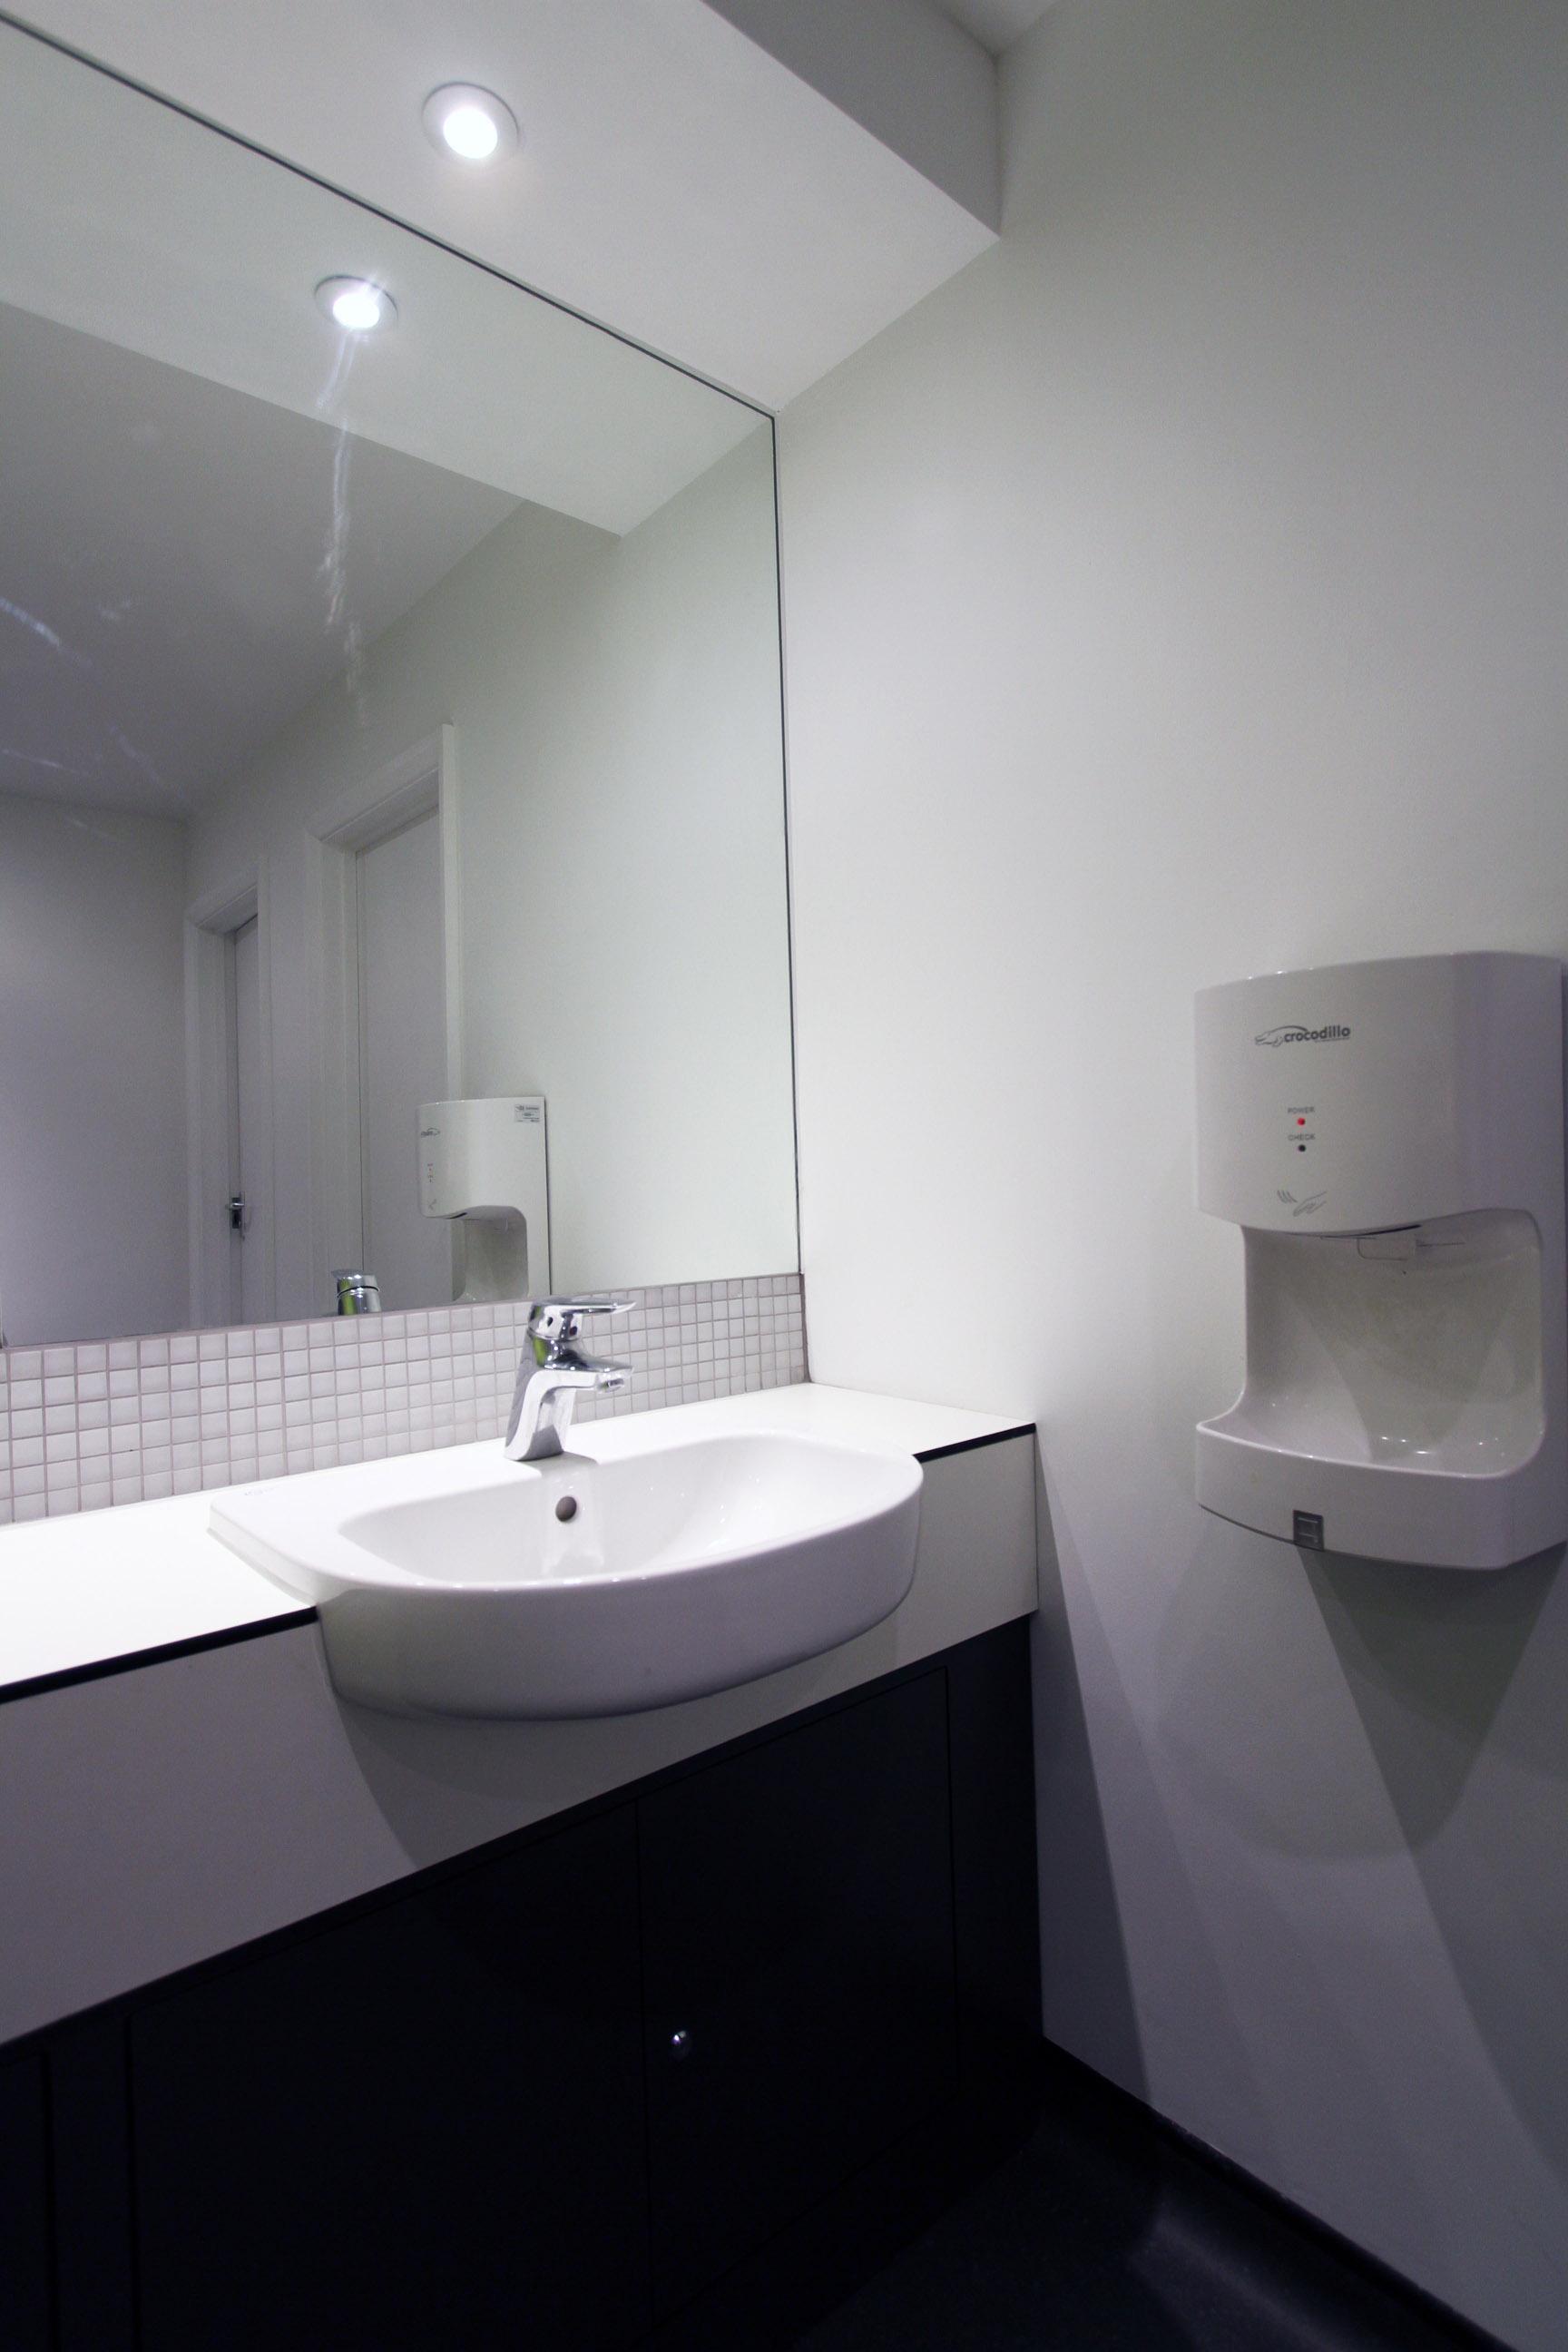 HURC Toilets F3